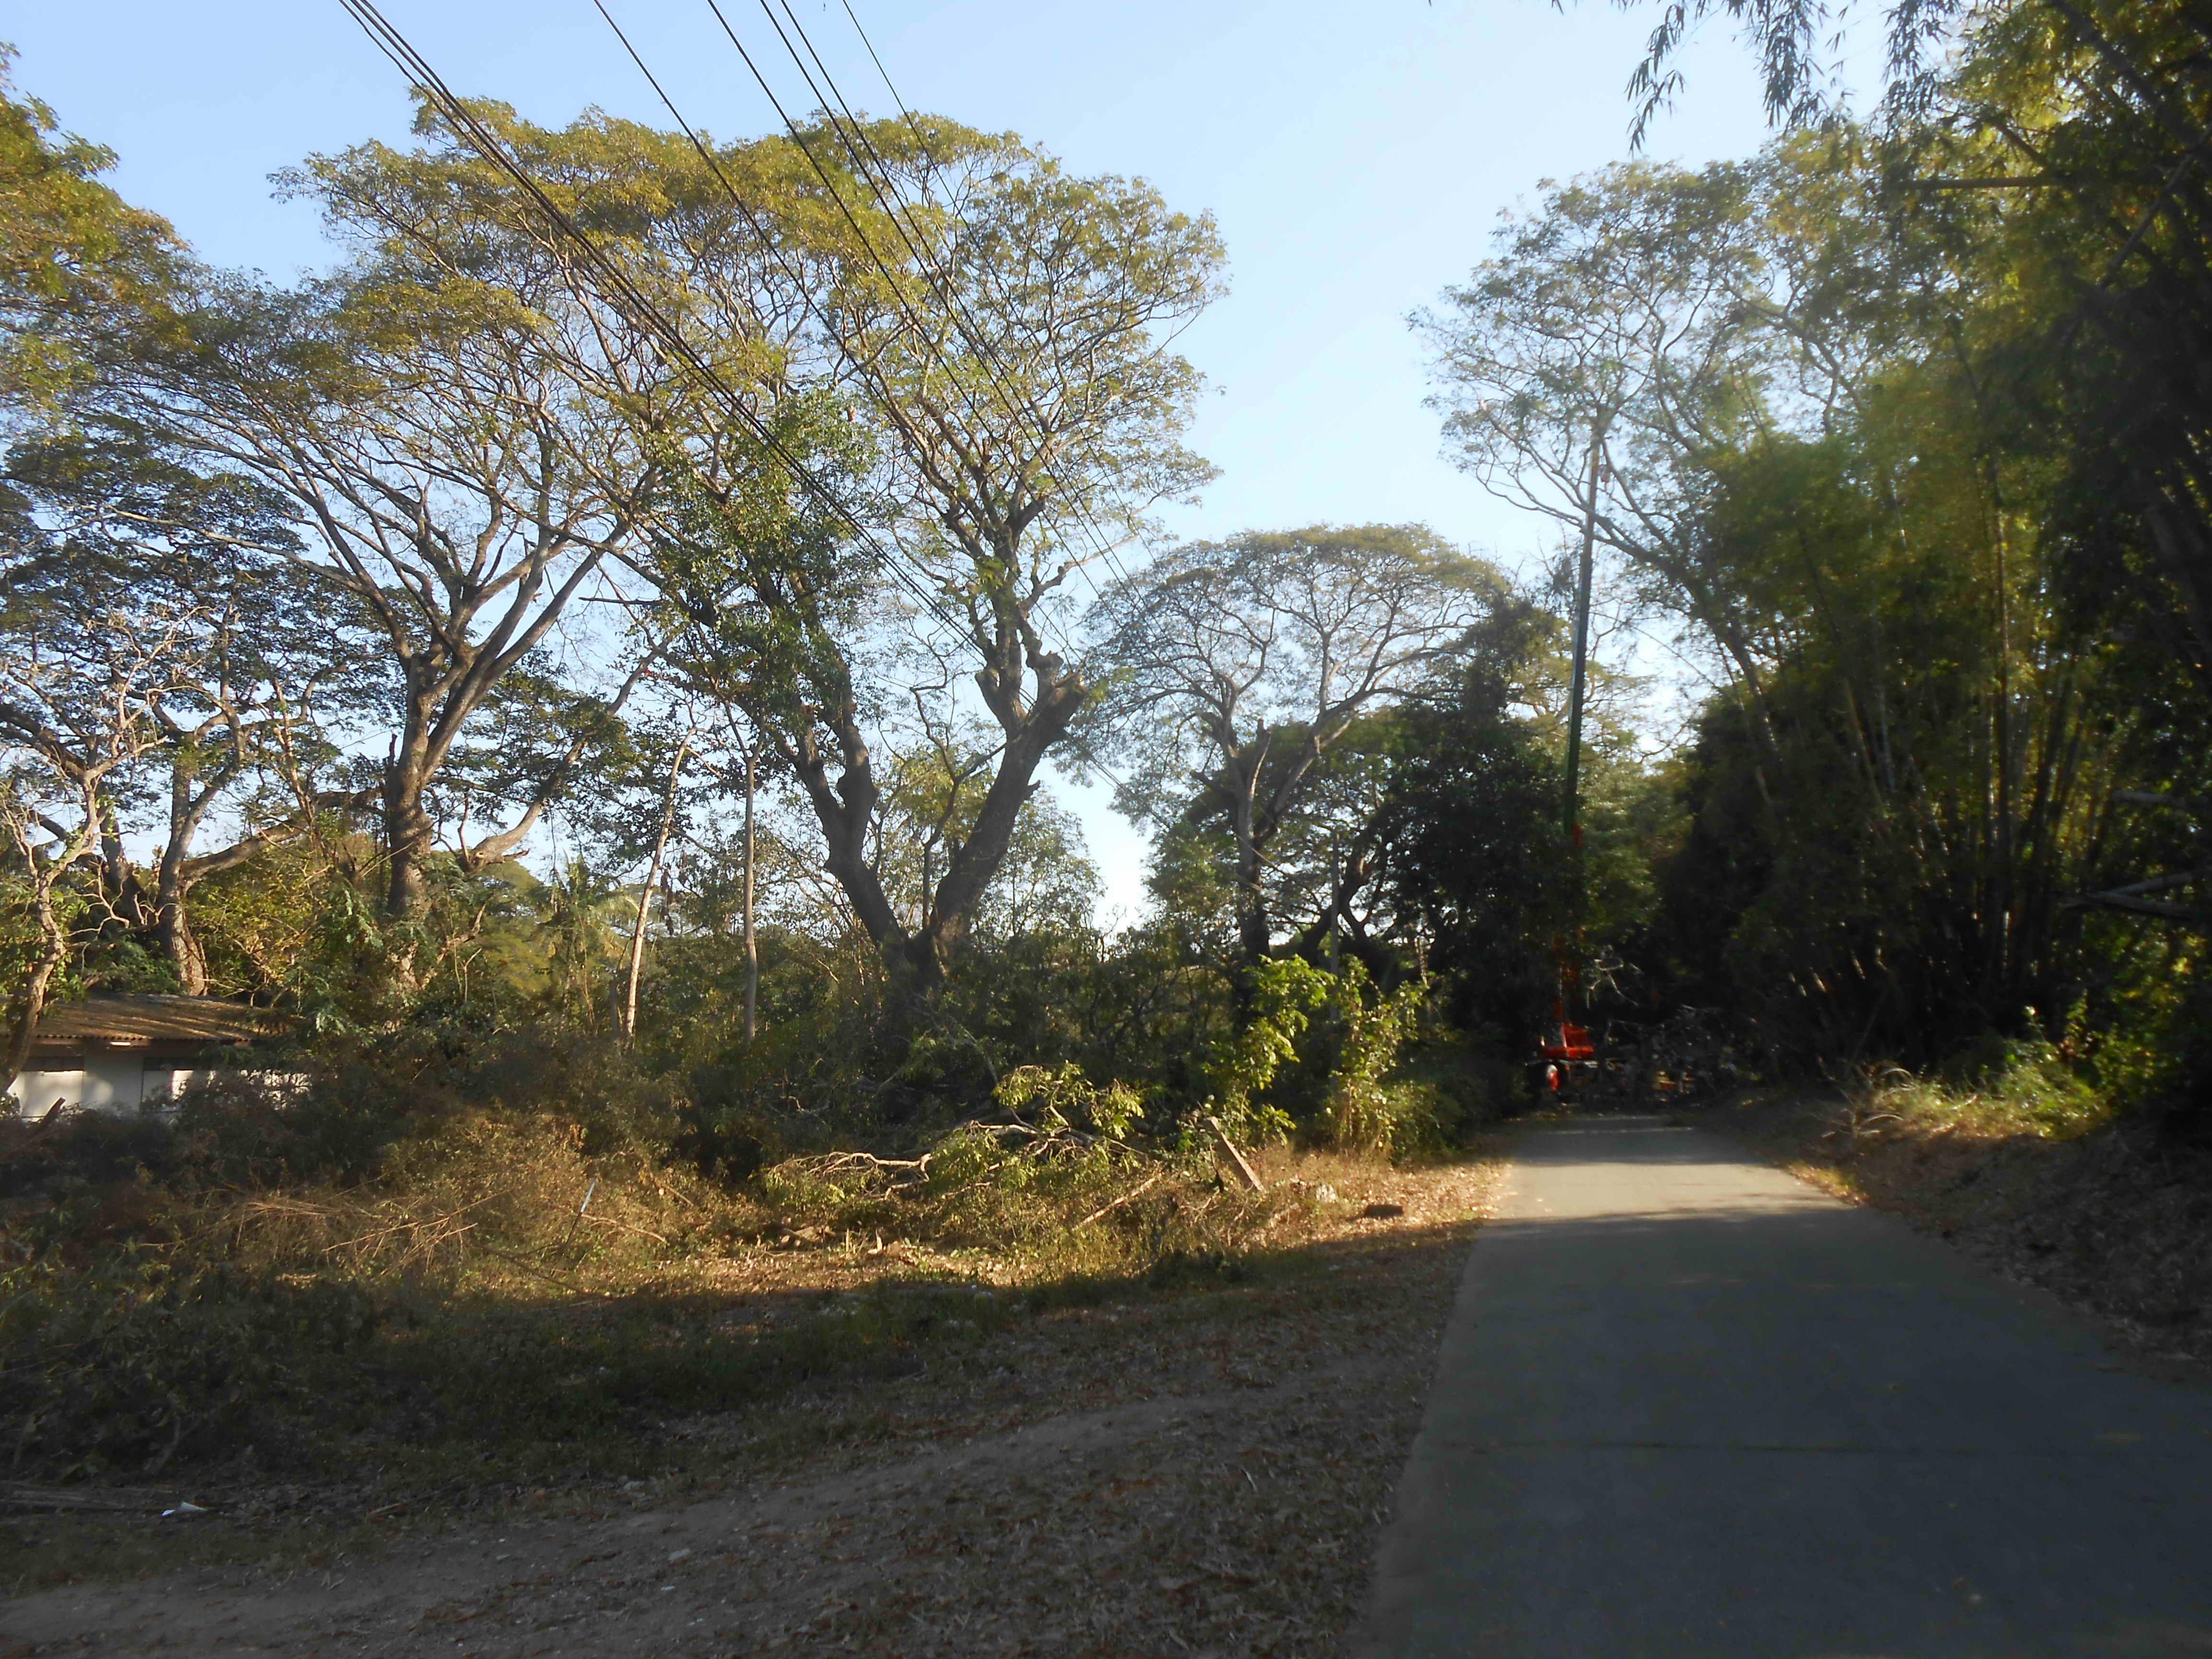 Chiang Mai Heritage Trees Axed